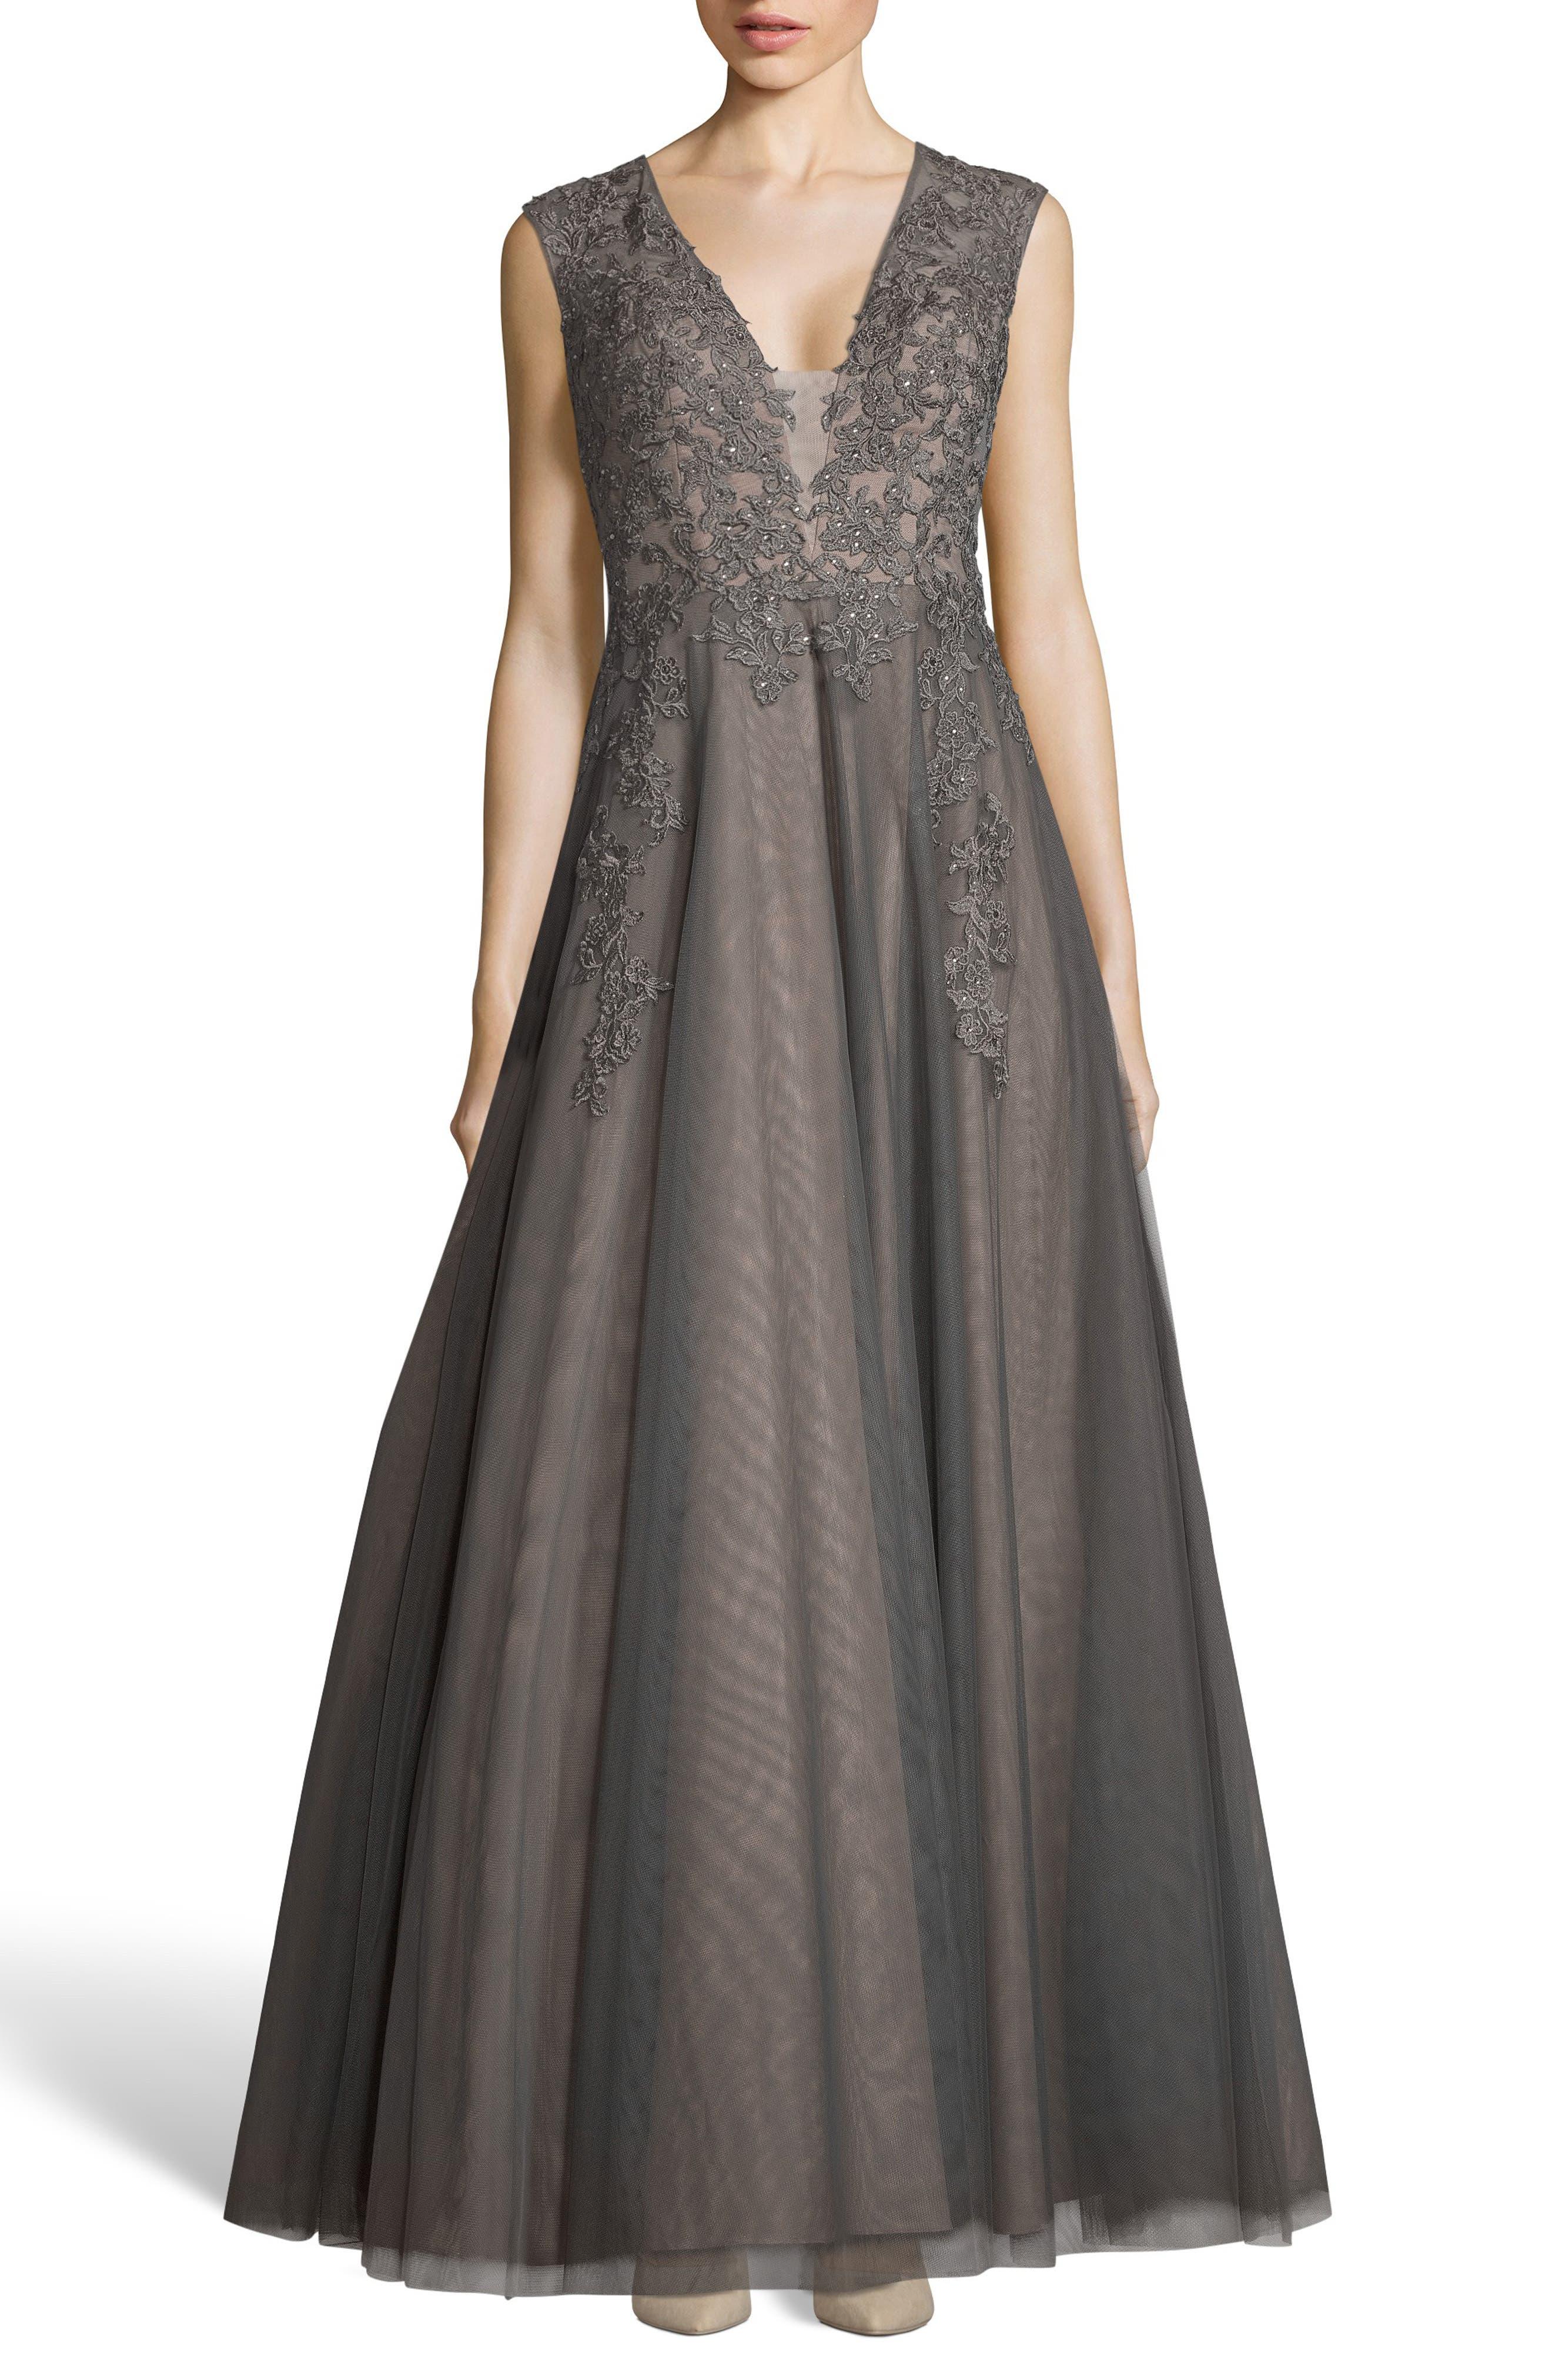 Xscape Applique Mesh Evening Dress, Grey